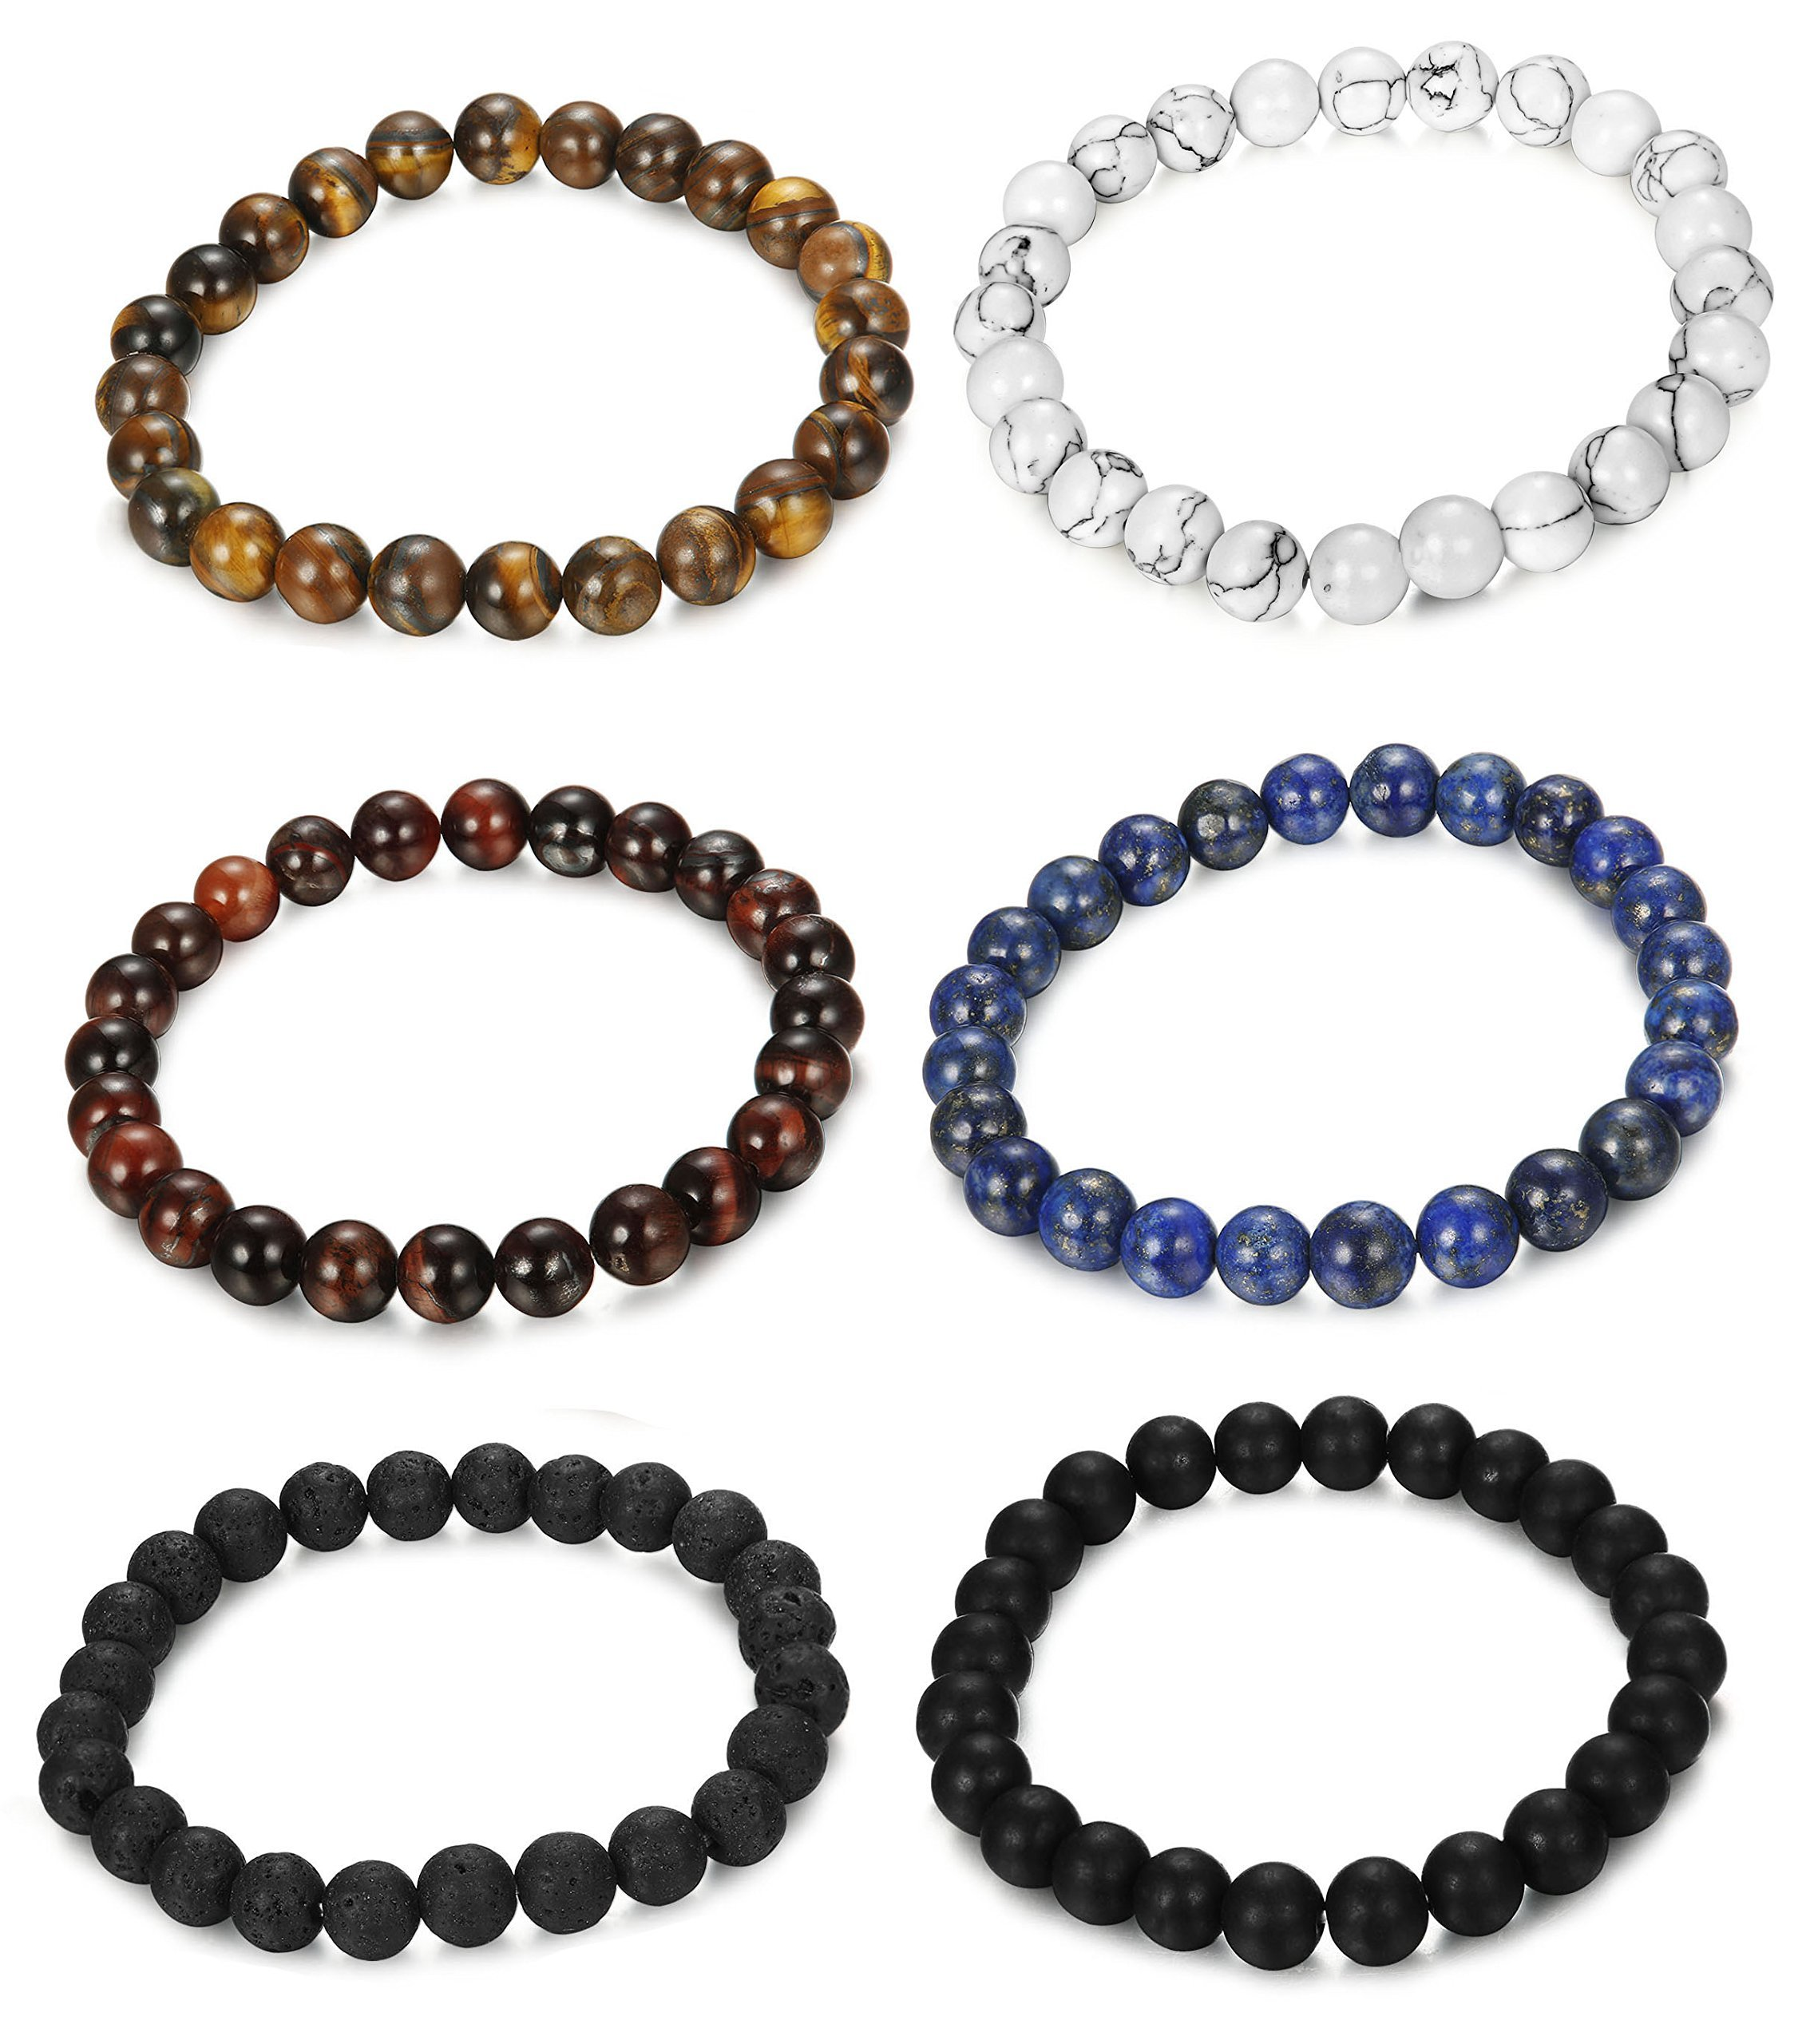 FUNRUN JEWELRY 6PCS Bead Bracelets for Men Women Natural Stone Mala Bracelet